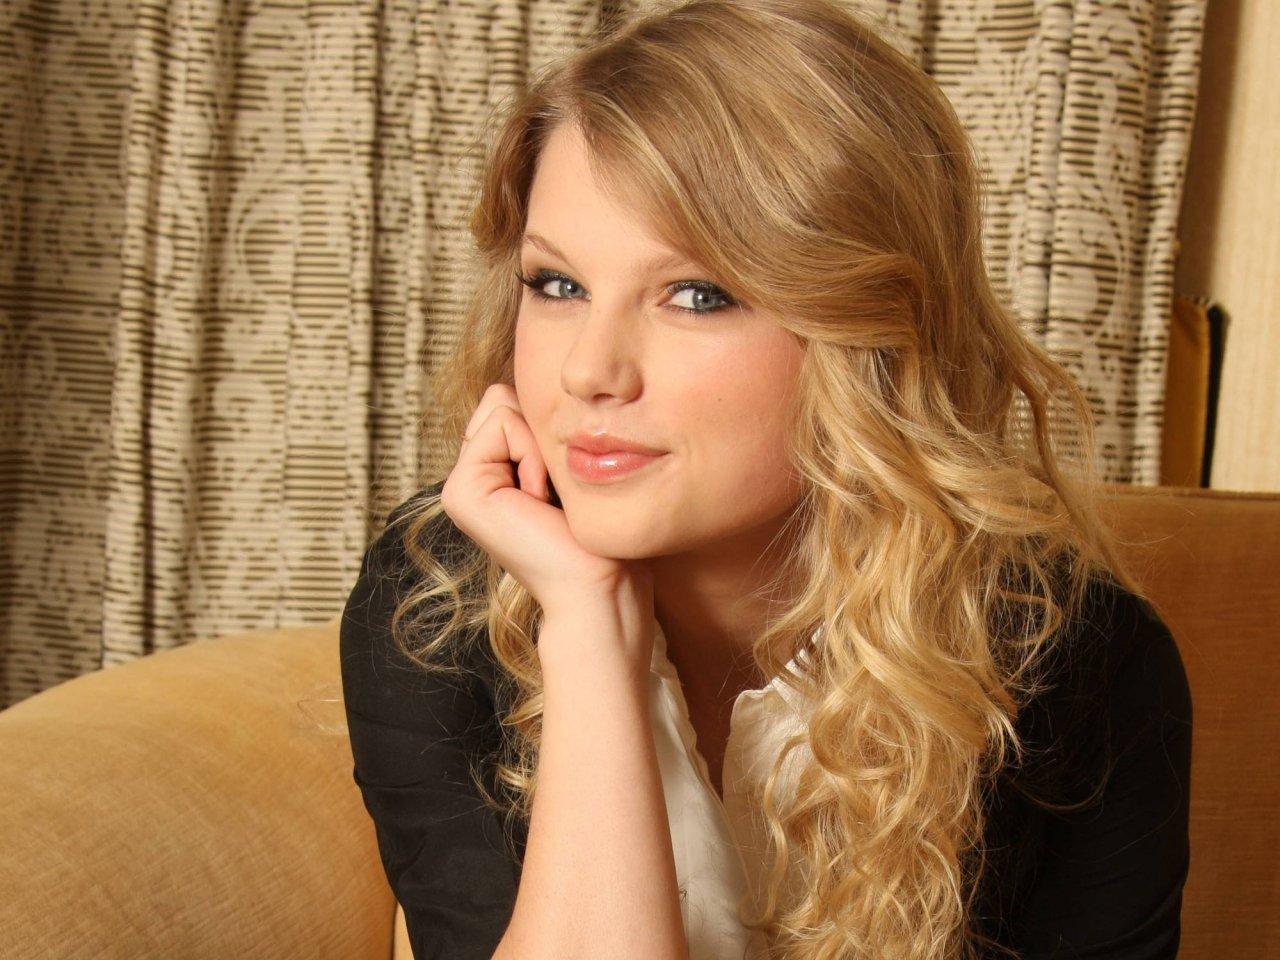 http://4.bp.blogspot.com/-9A8CirpLAzM/T_GNJxi6FnI/AAAAAAAADMs/RNRBHf6B9nY/s1600/Taylor-Swift-012.jpg